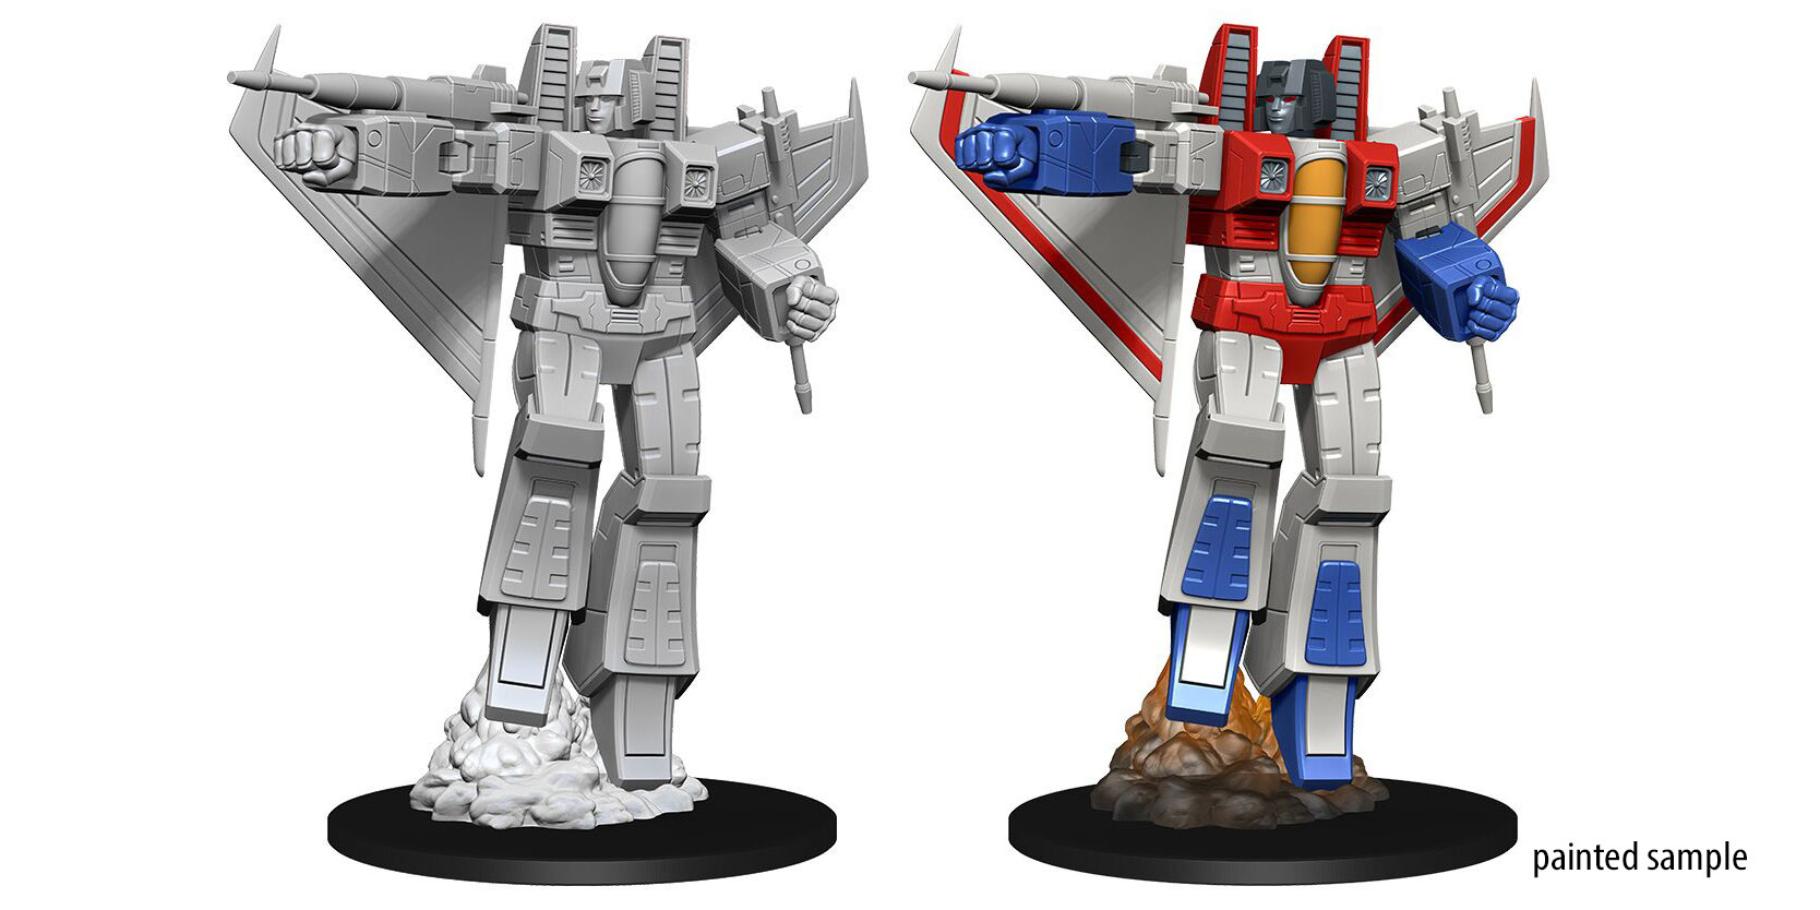 WizKids Transformers Deep Cuts Unpainted Miniatures: Starscream (1)